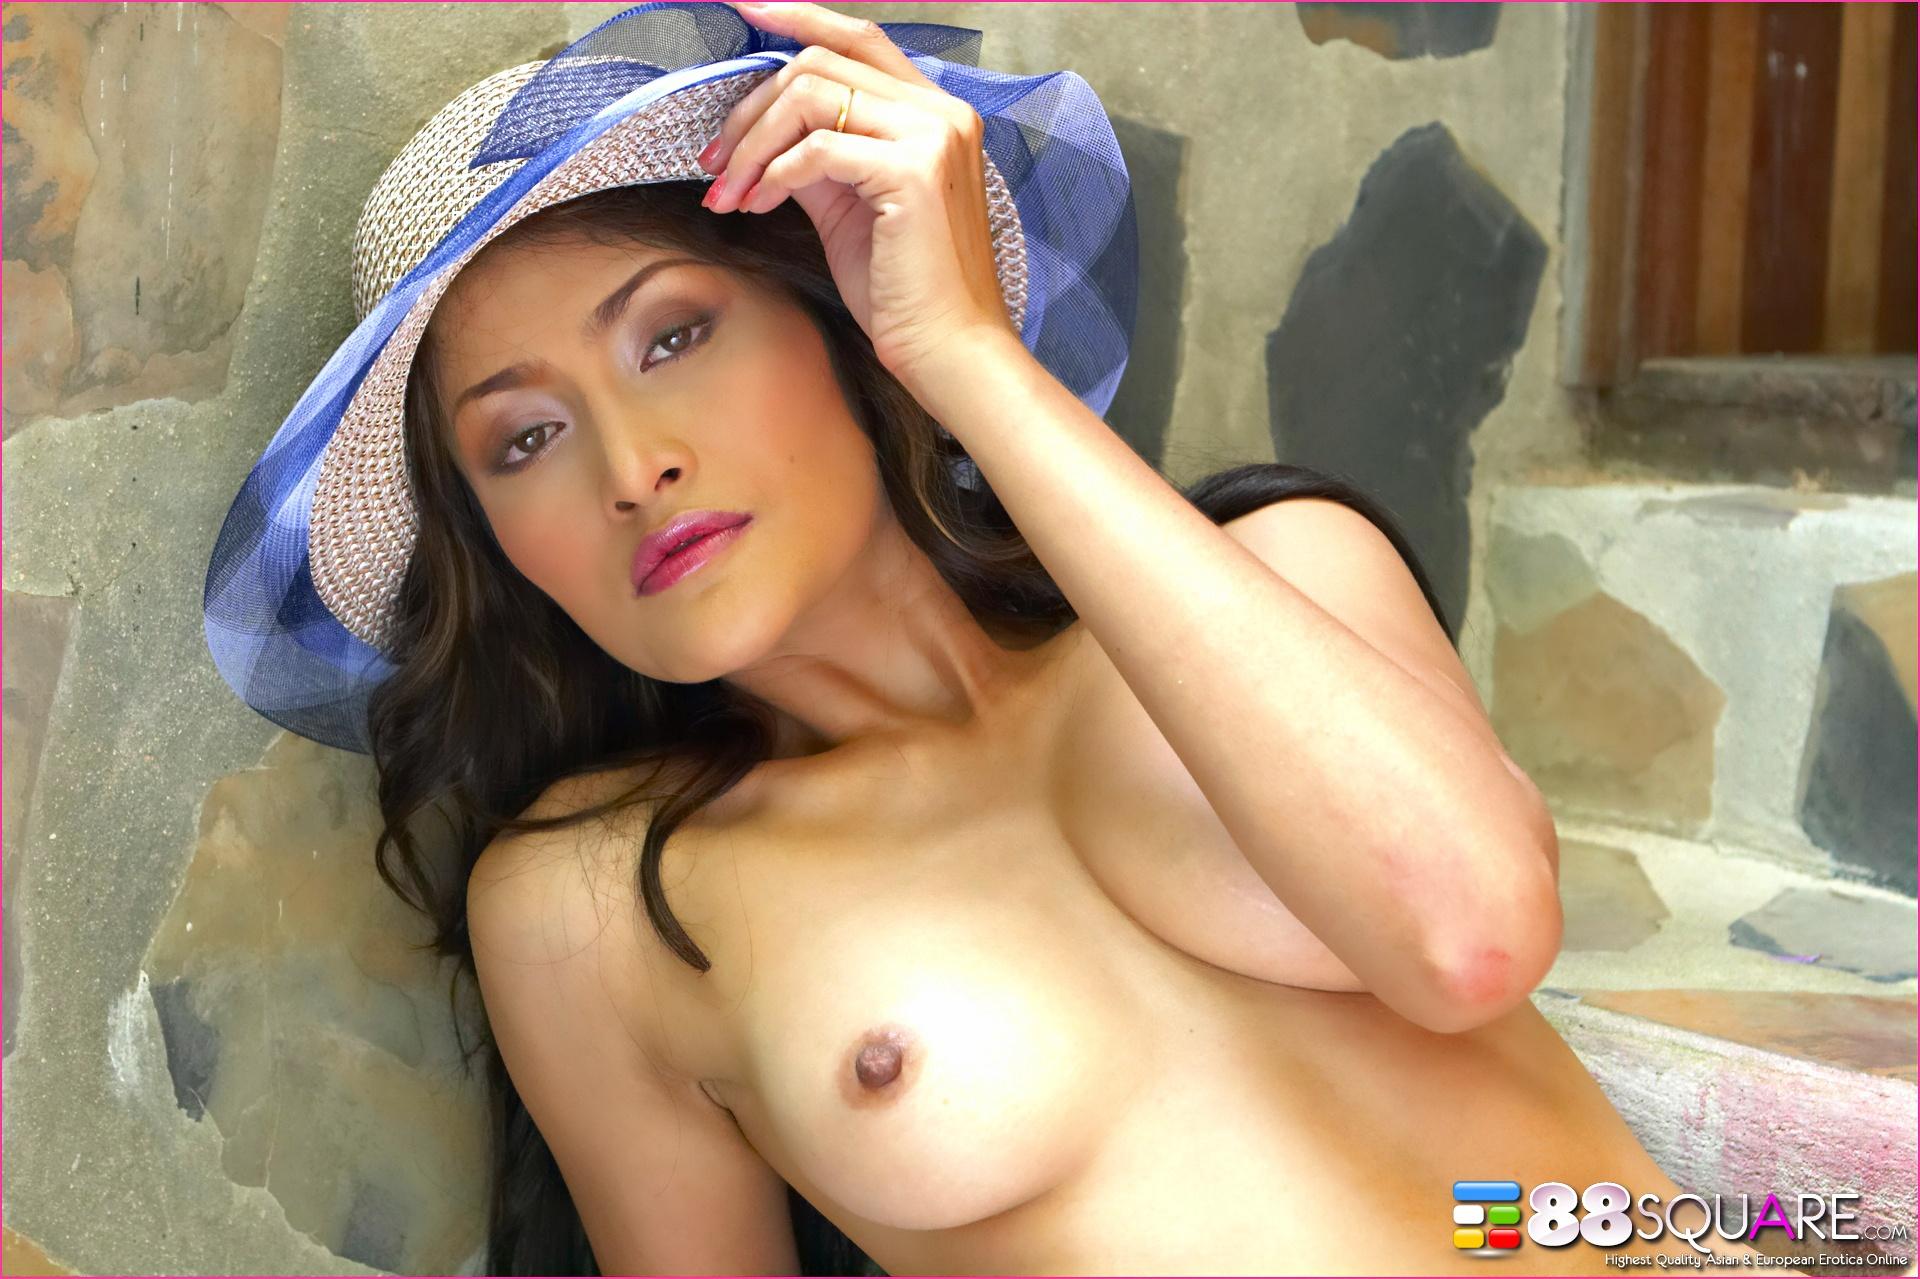 bollywood hd actress mega thread nude porn images